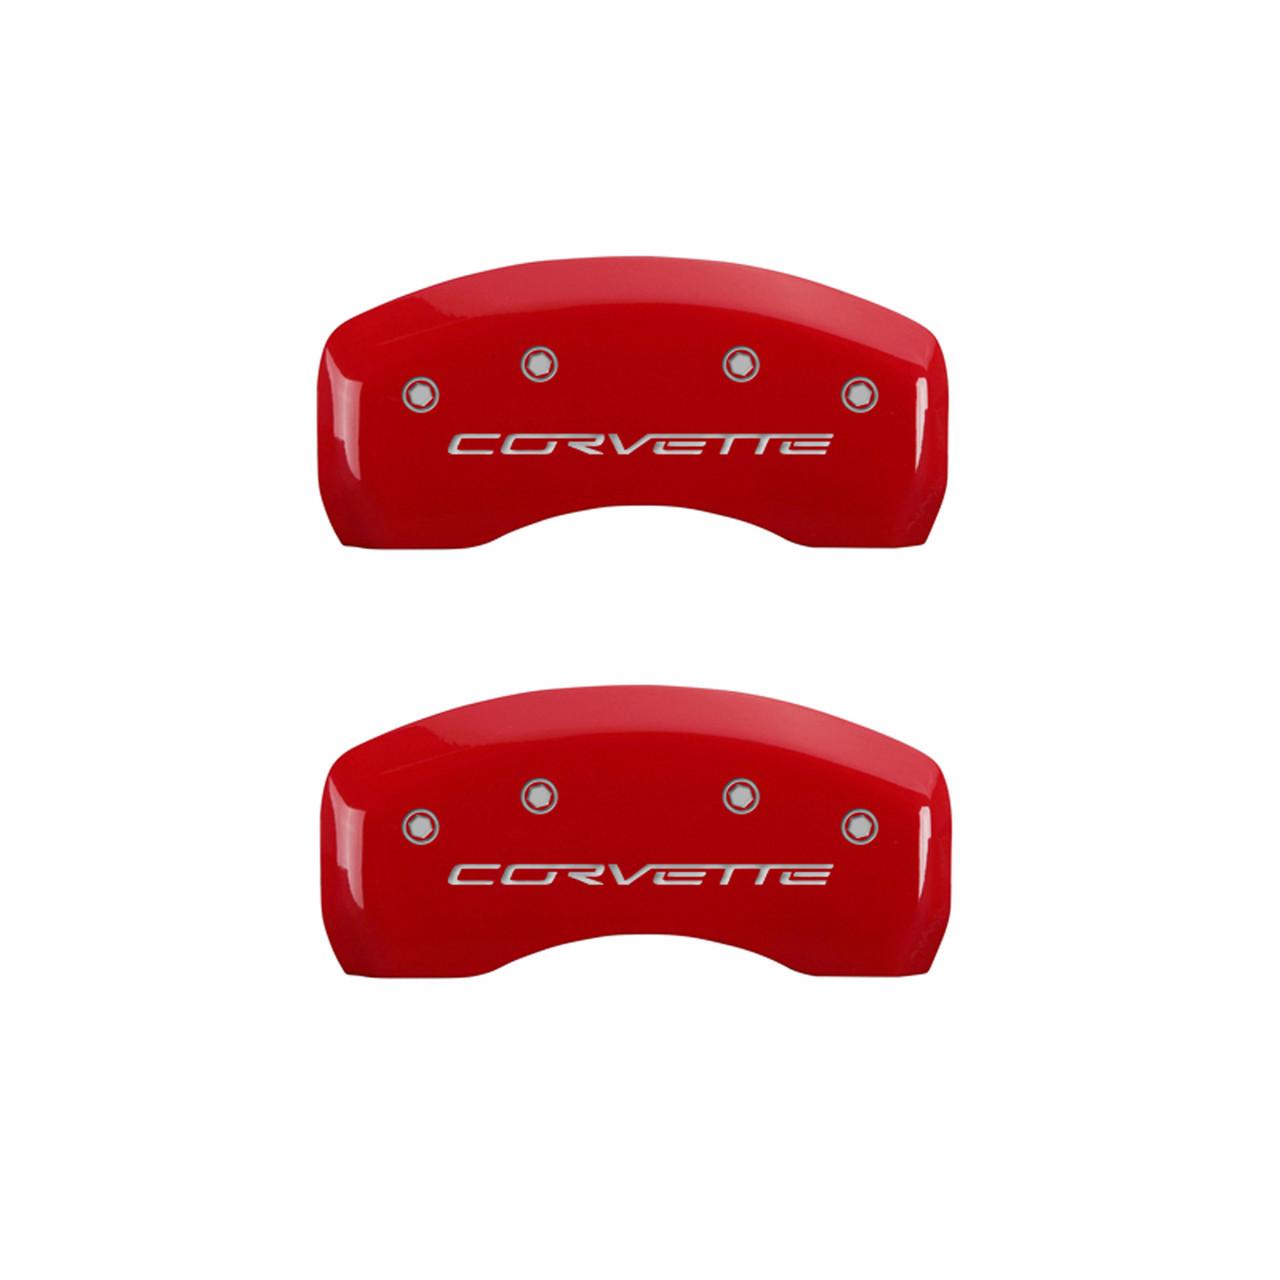 Corvette Brake Caliper Cover Red (rear)